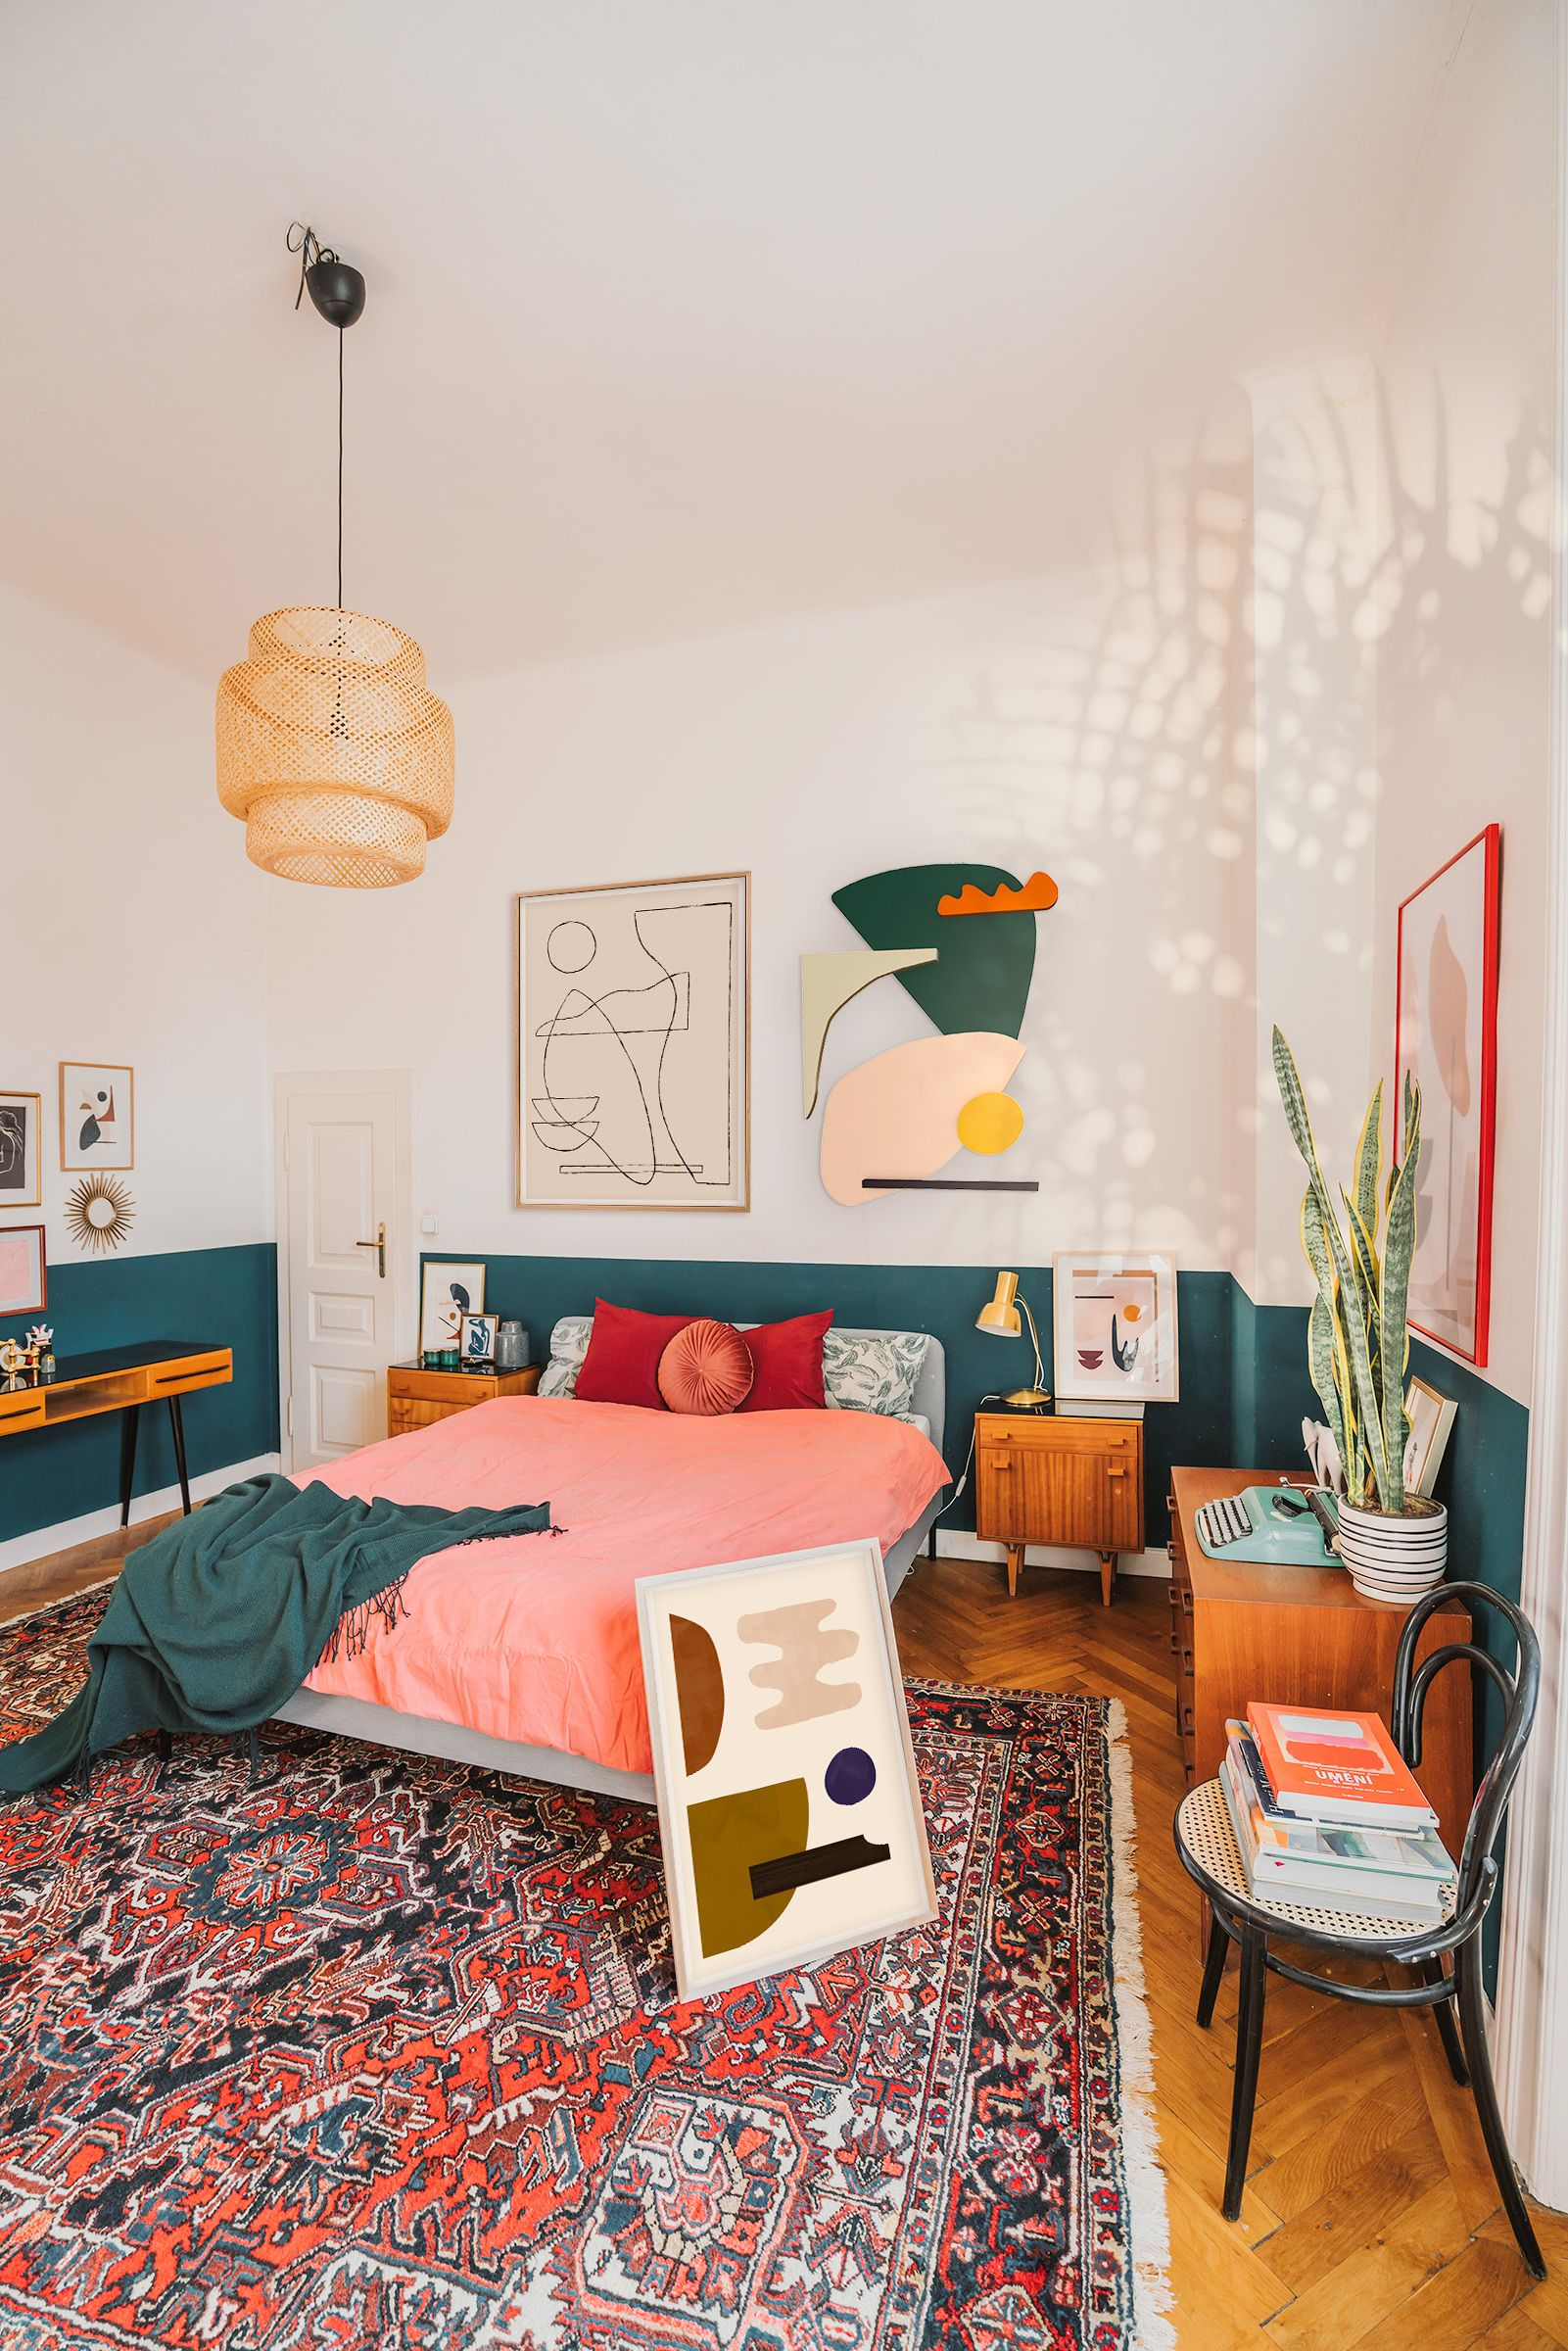 37+ Eclectic dorm room ideas trends